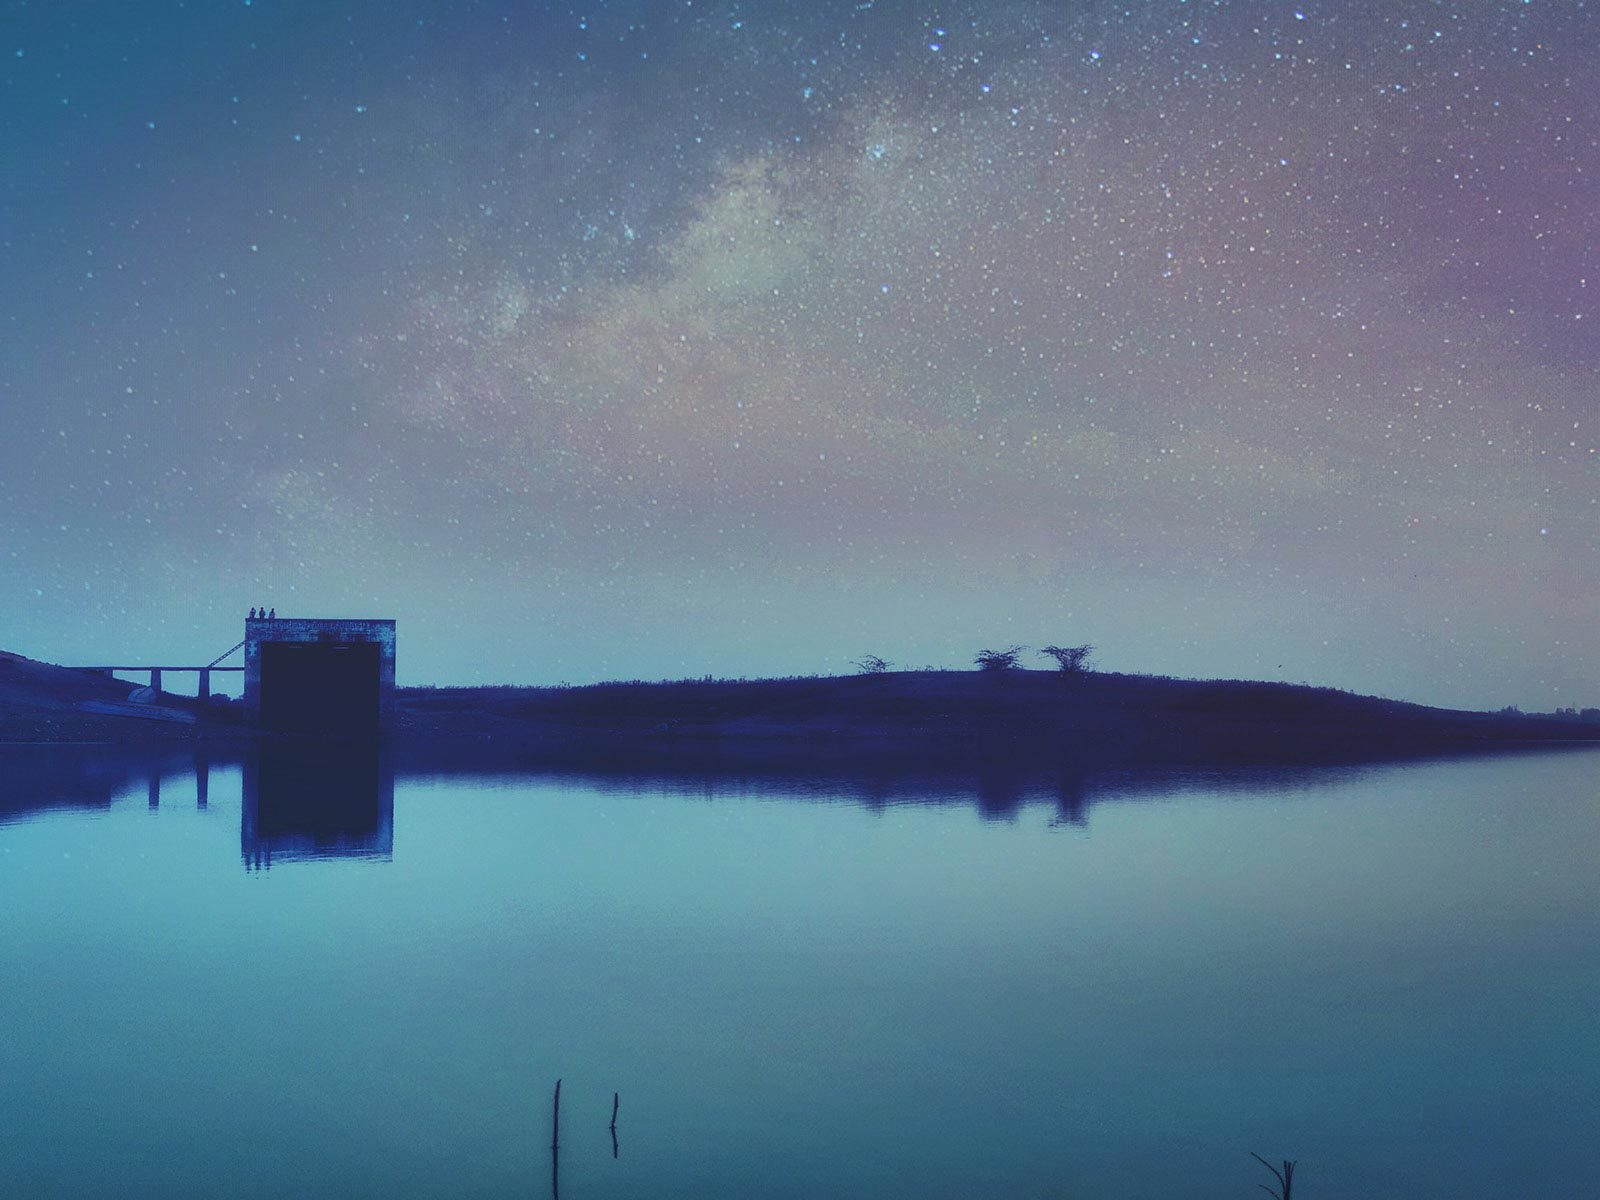 Blue body of water under light starry sky.